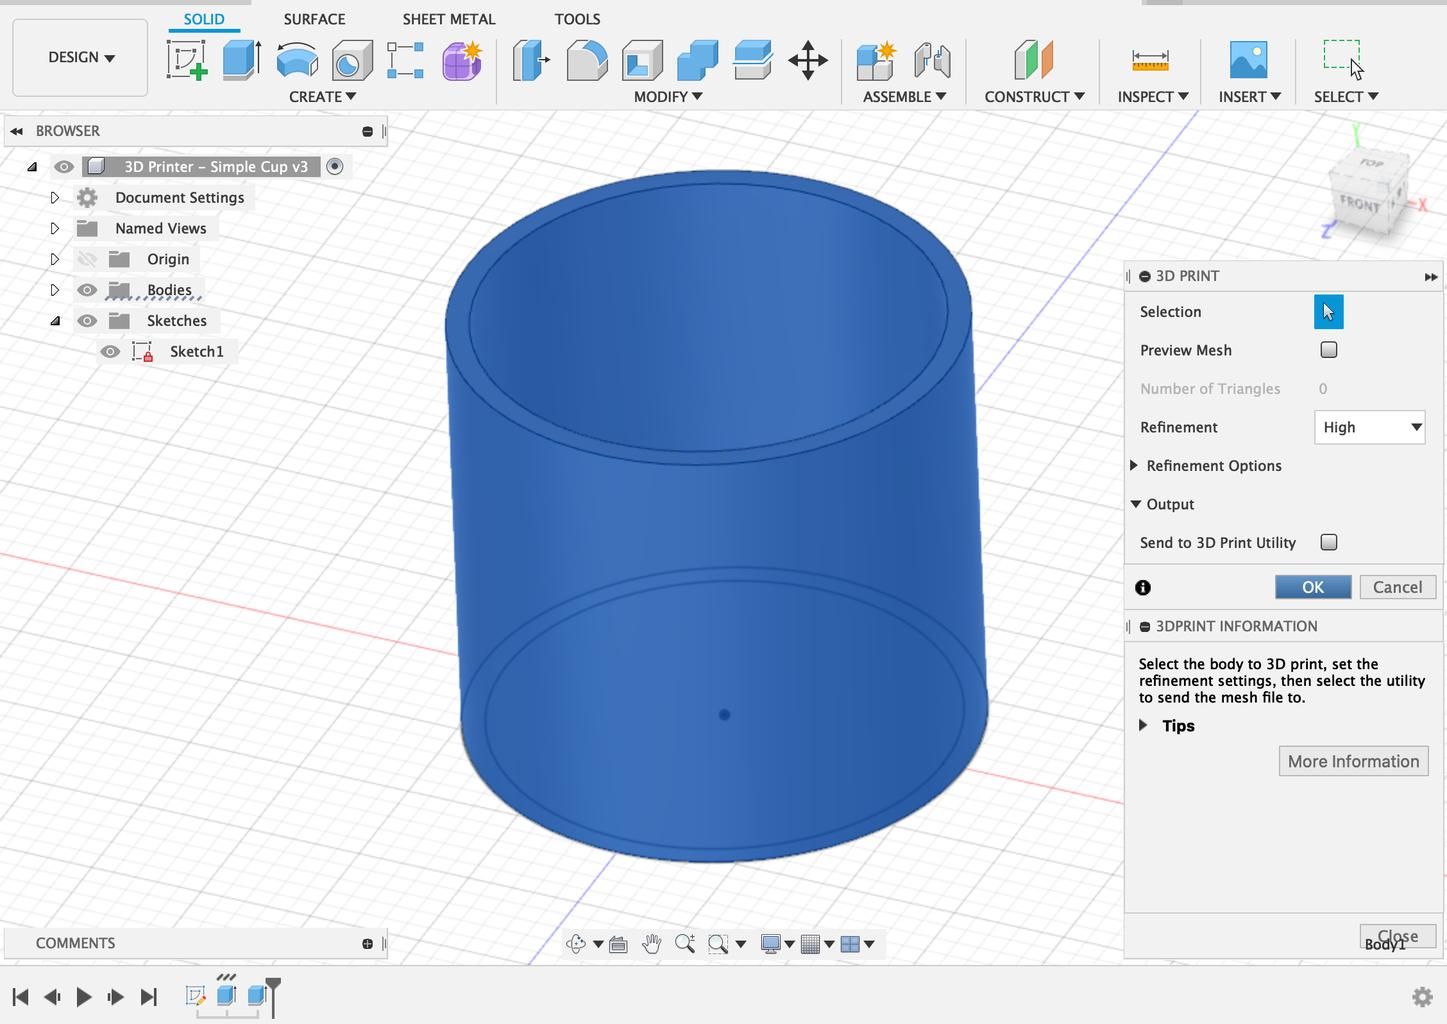 Export Your 3d Design As an STL File